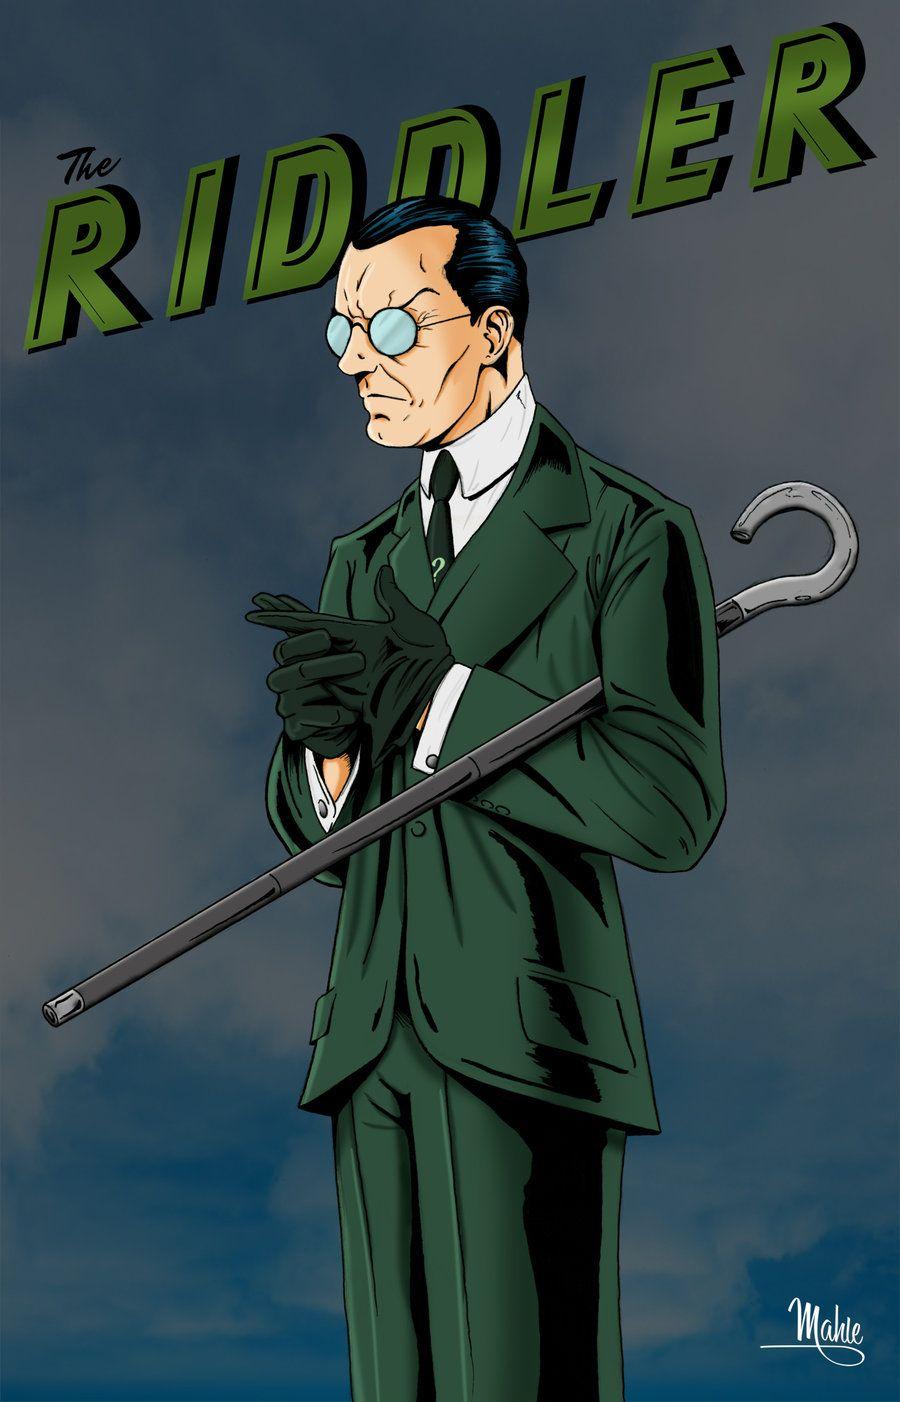 The Riddler by Gotham villains